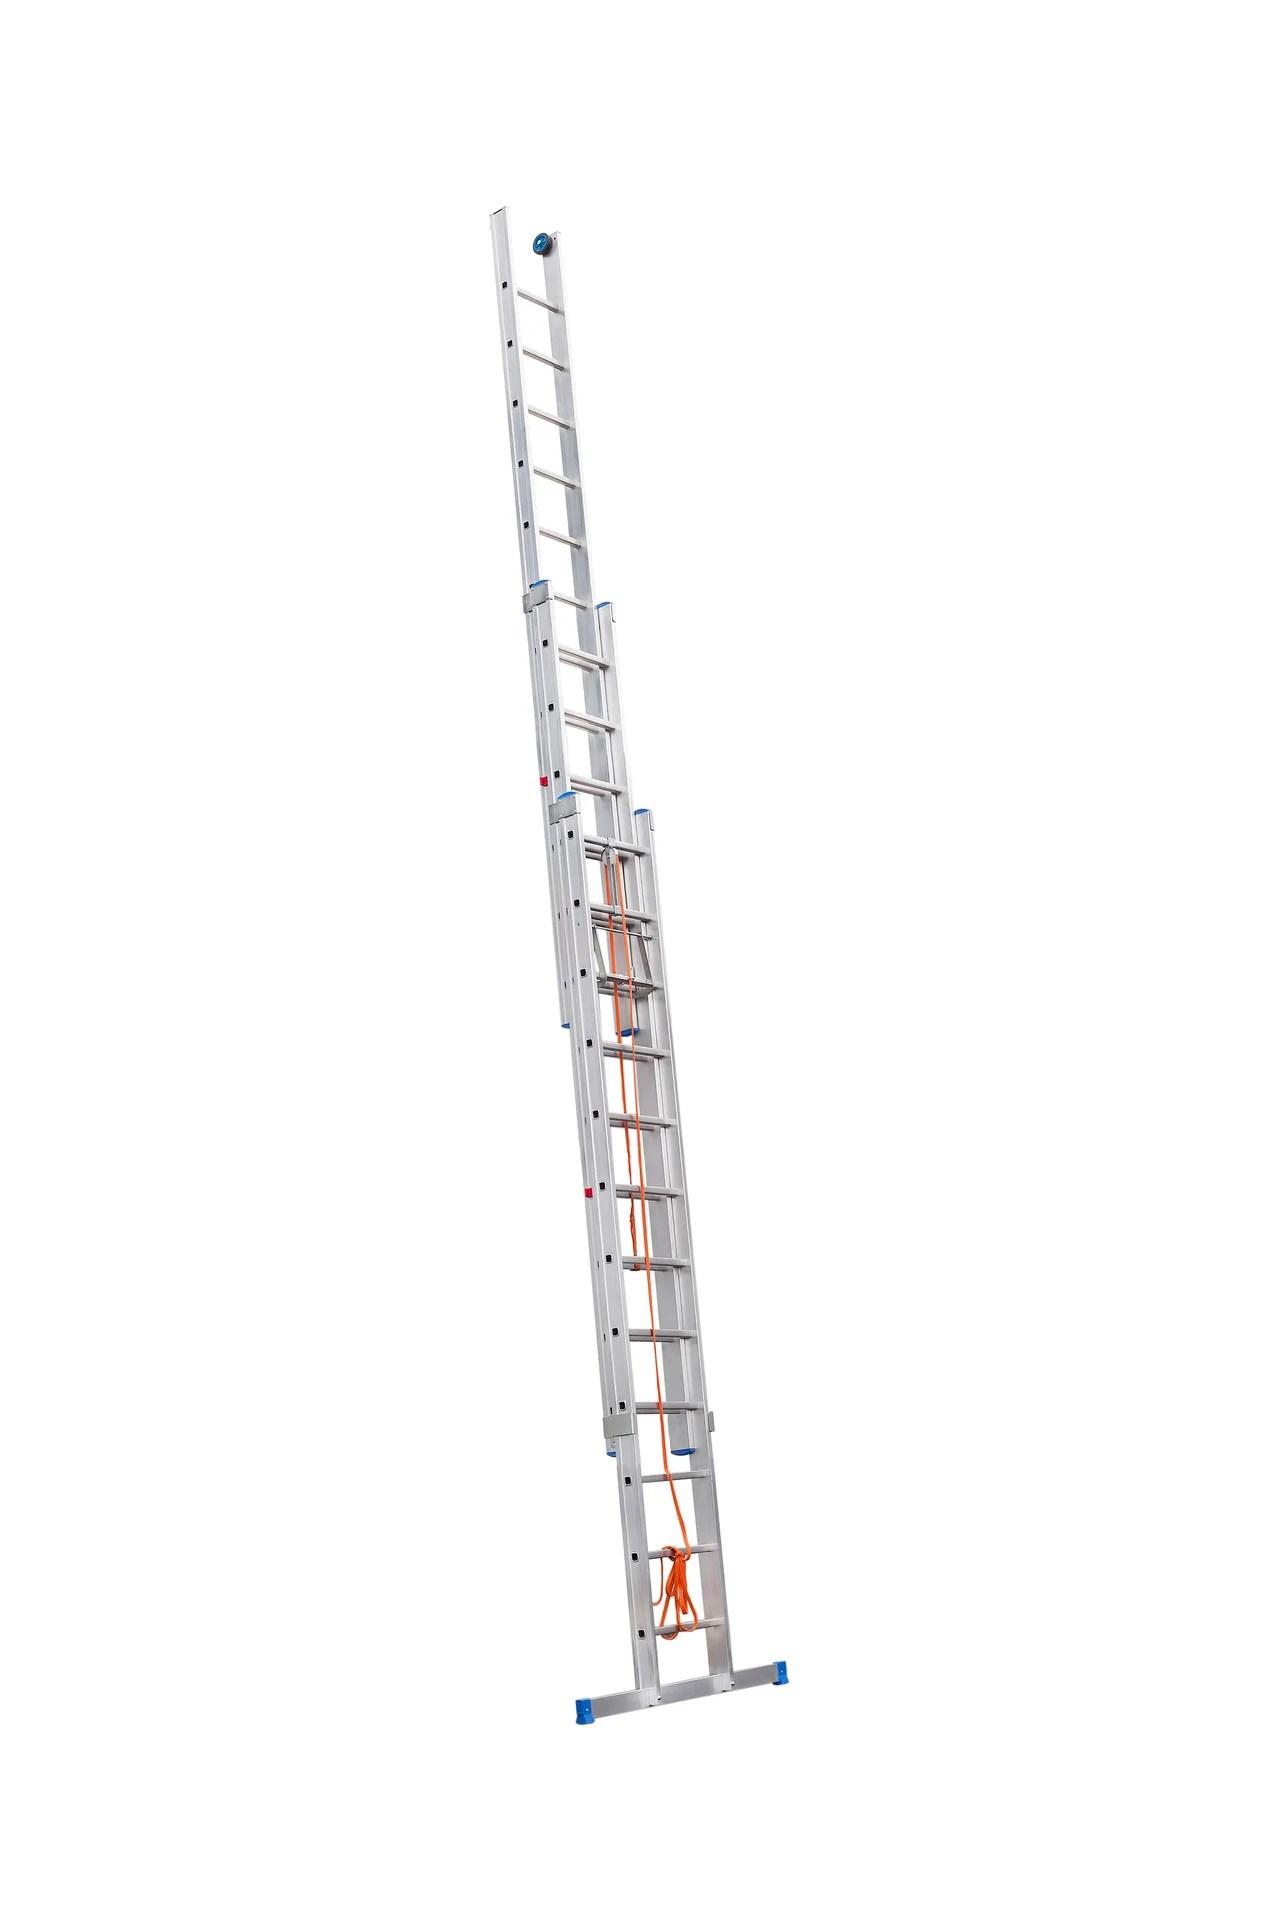 Echelle Coulissante Aluminium Hailo 3x12 Echelons H 7 53 M Leroy Merlin